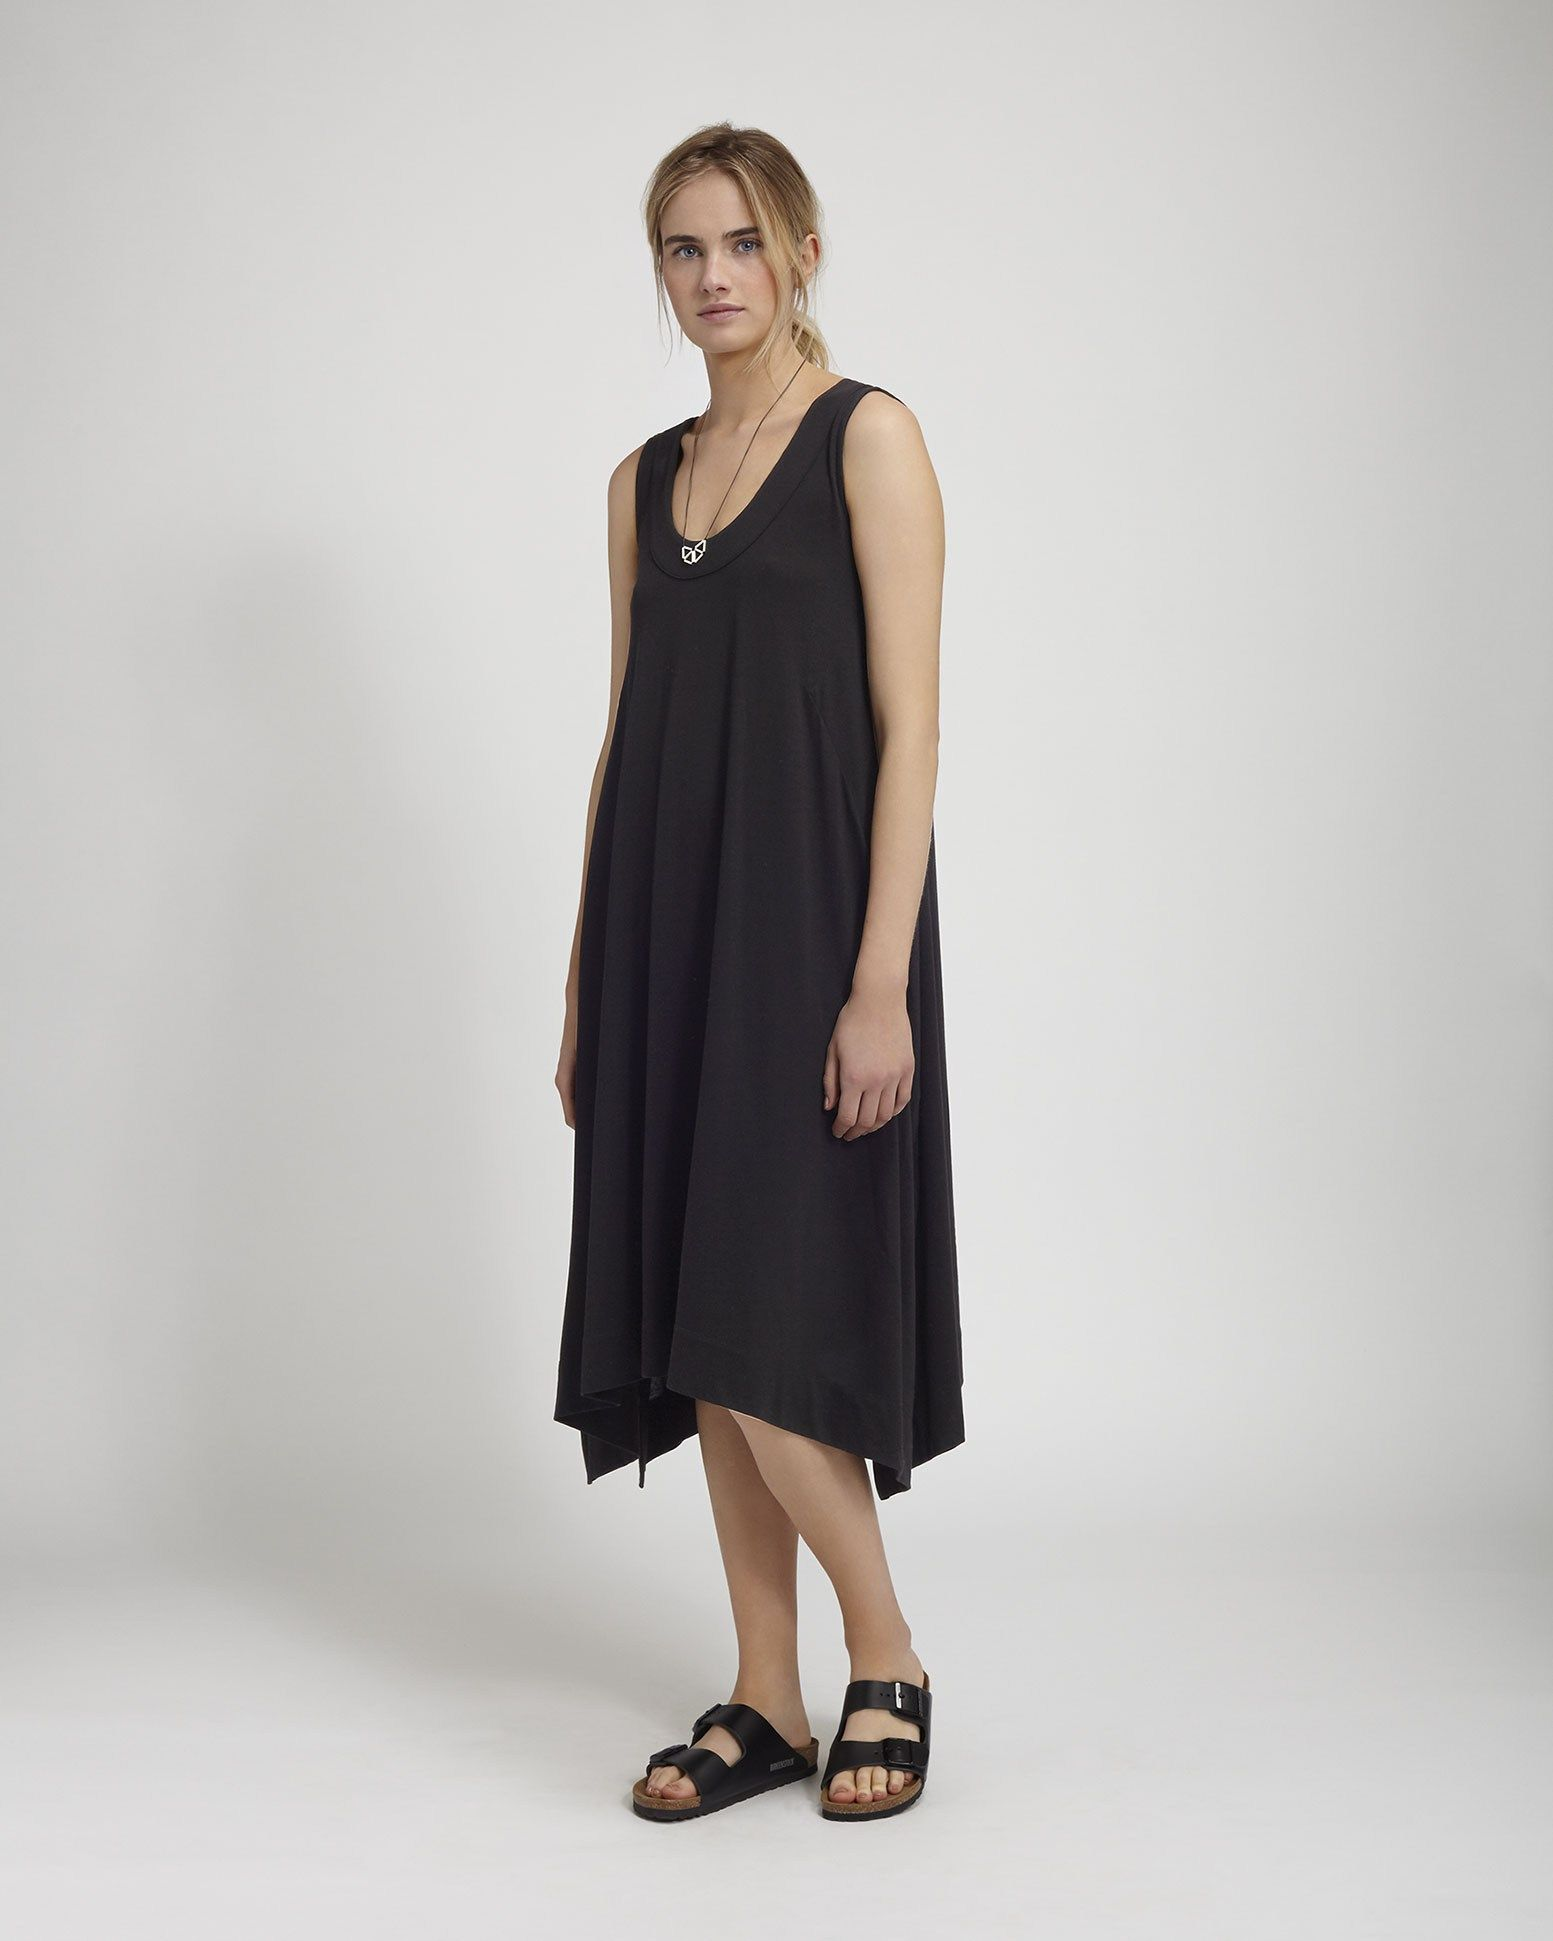 deb370e8af2 Women s Black lyocell Cotton Verene Dress